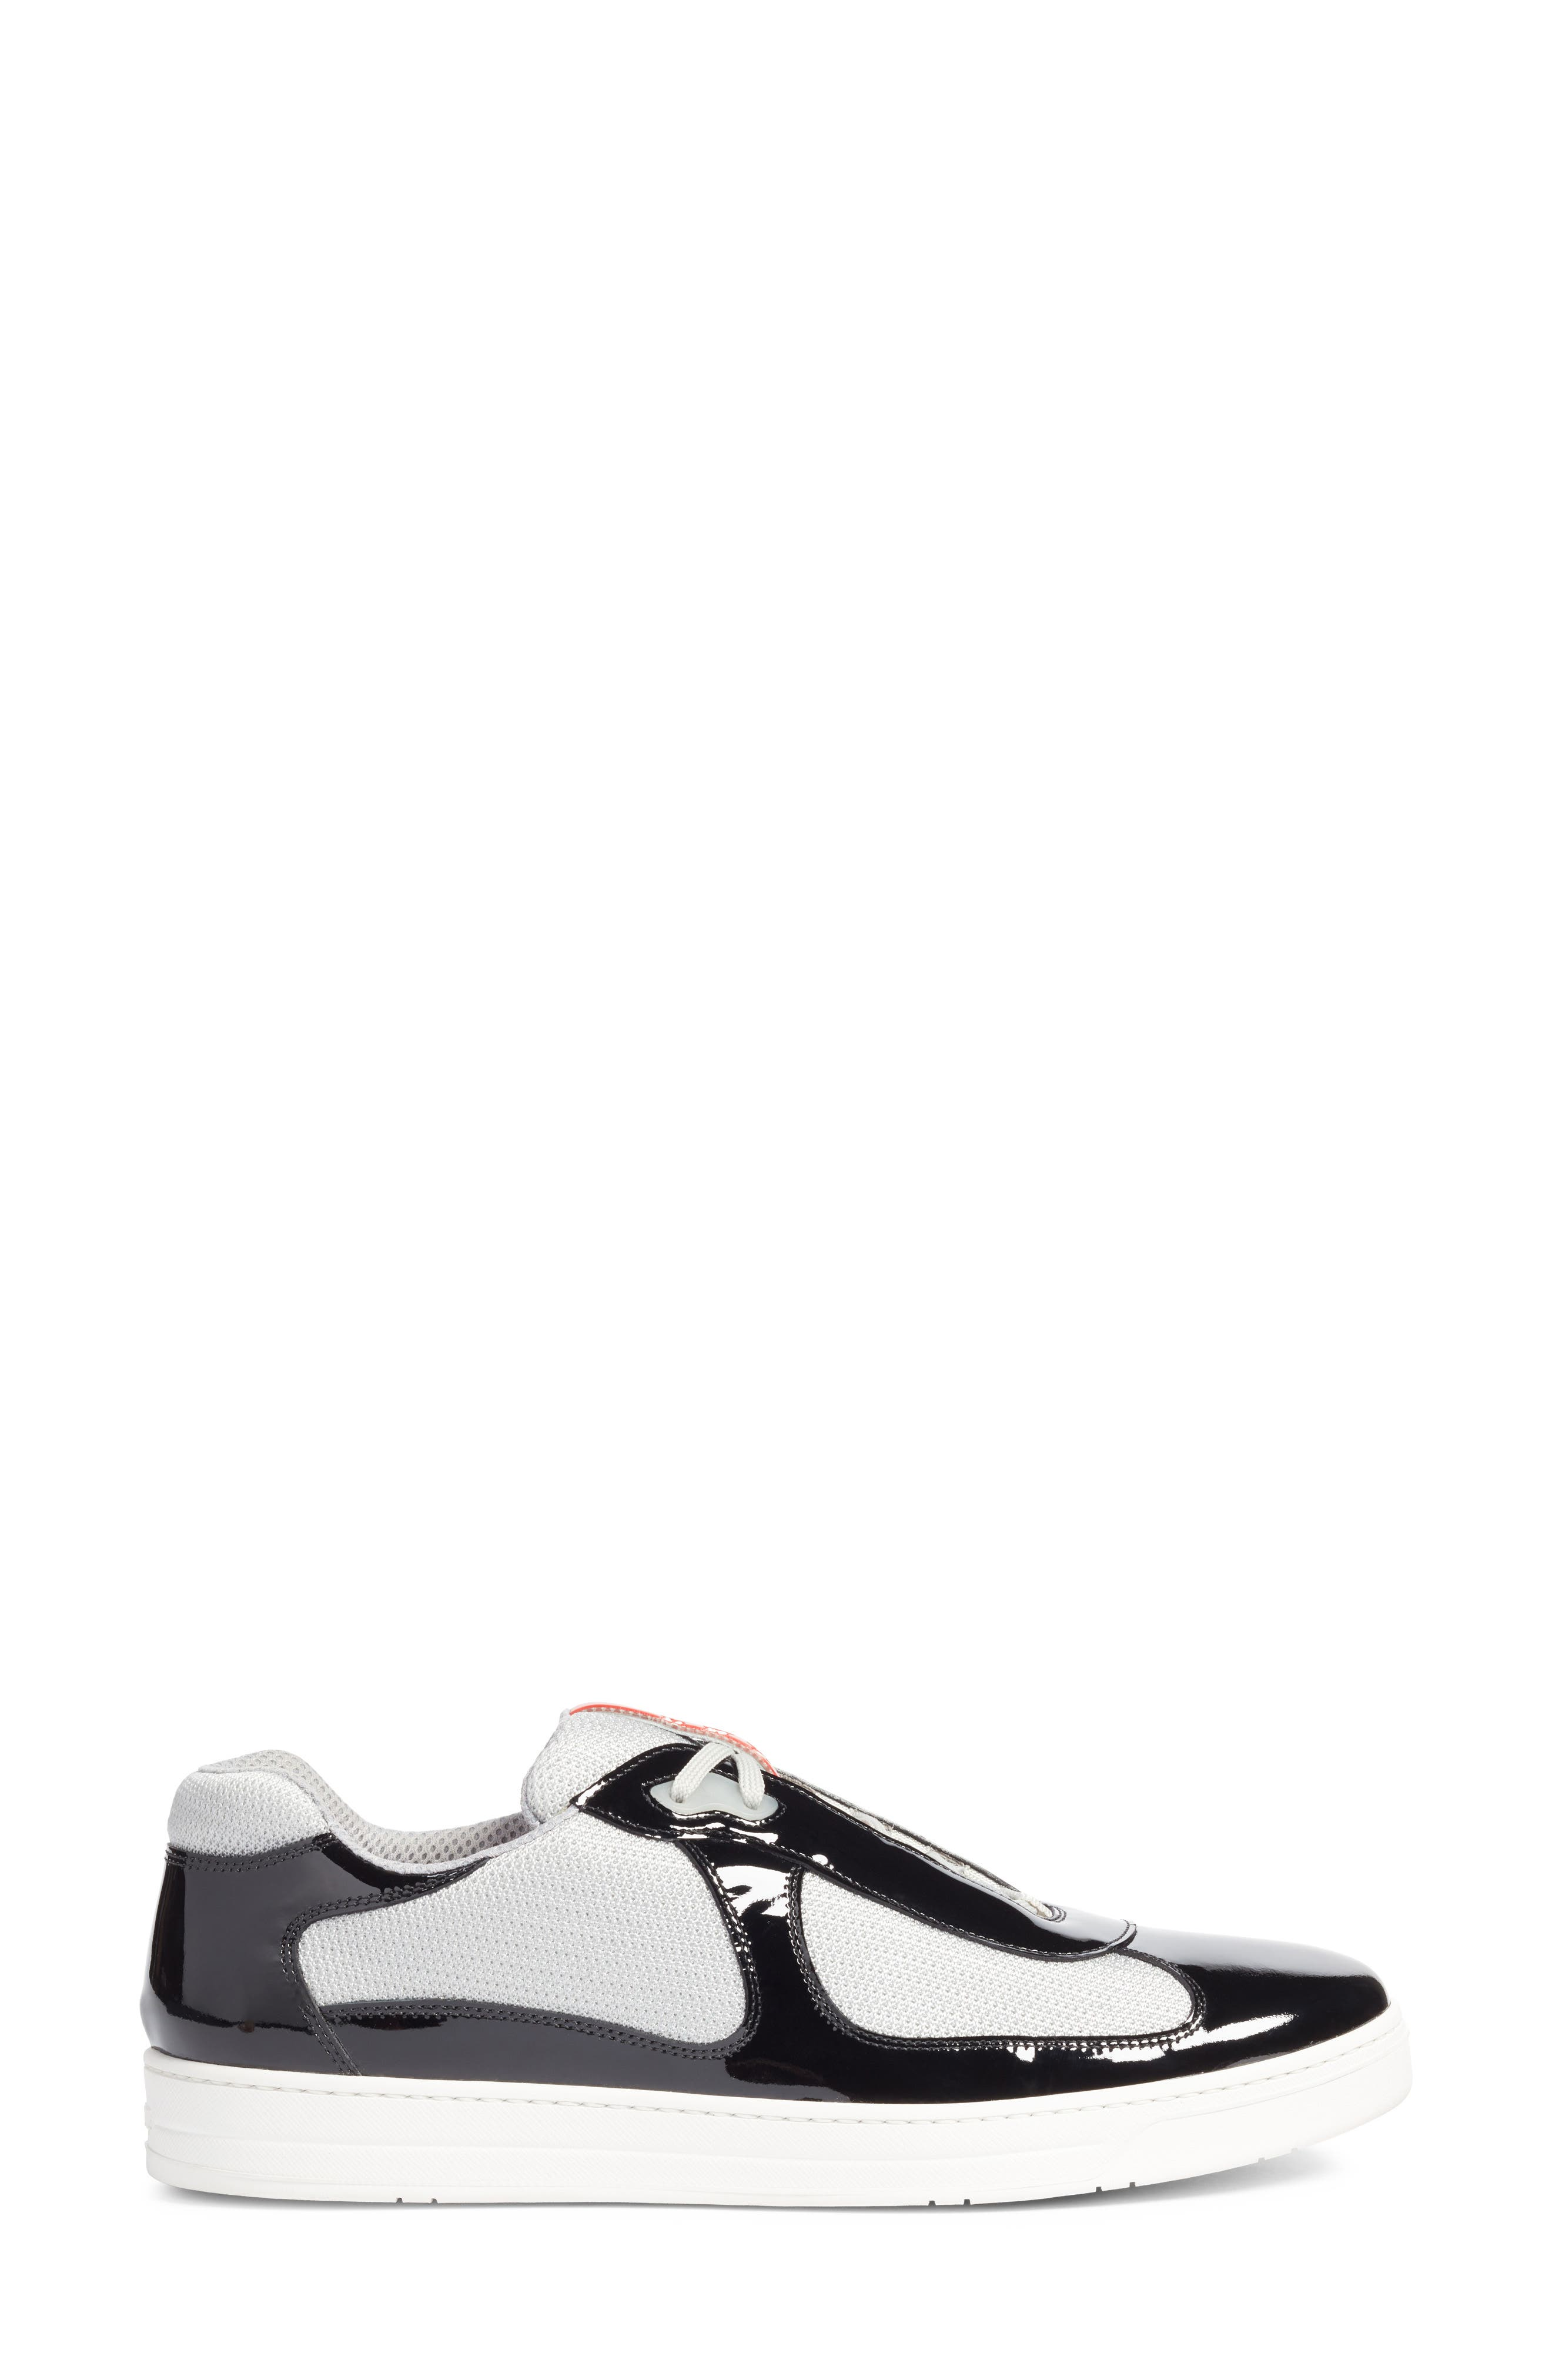 Linea Rossa New America's Cup Sneaker,                             Alternate thumbnail 3, color,                             Nero Argento